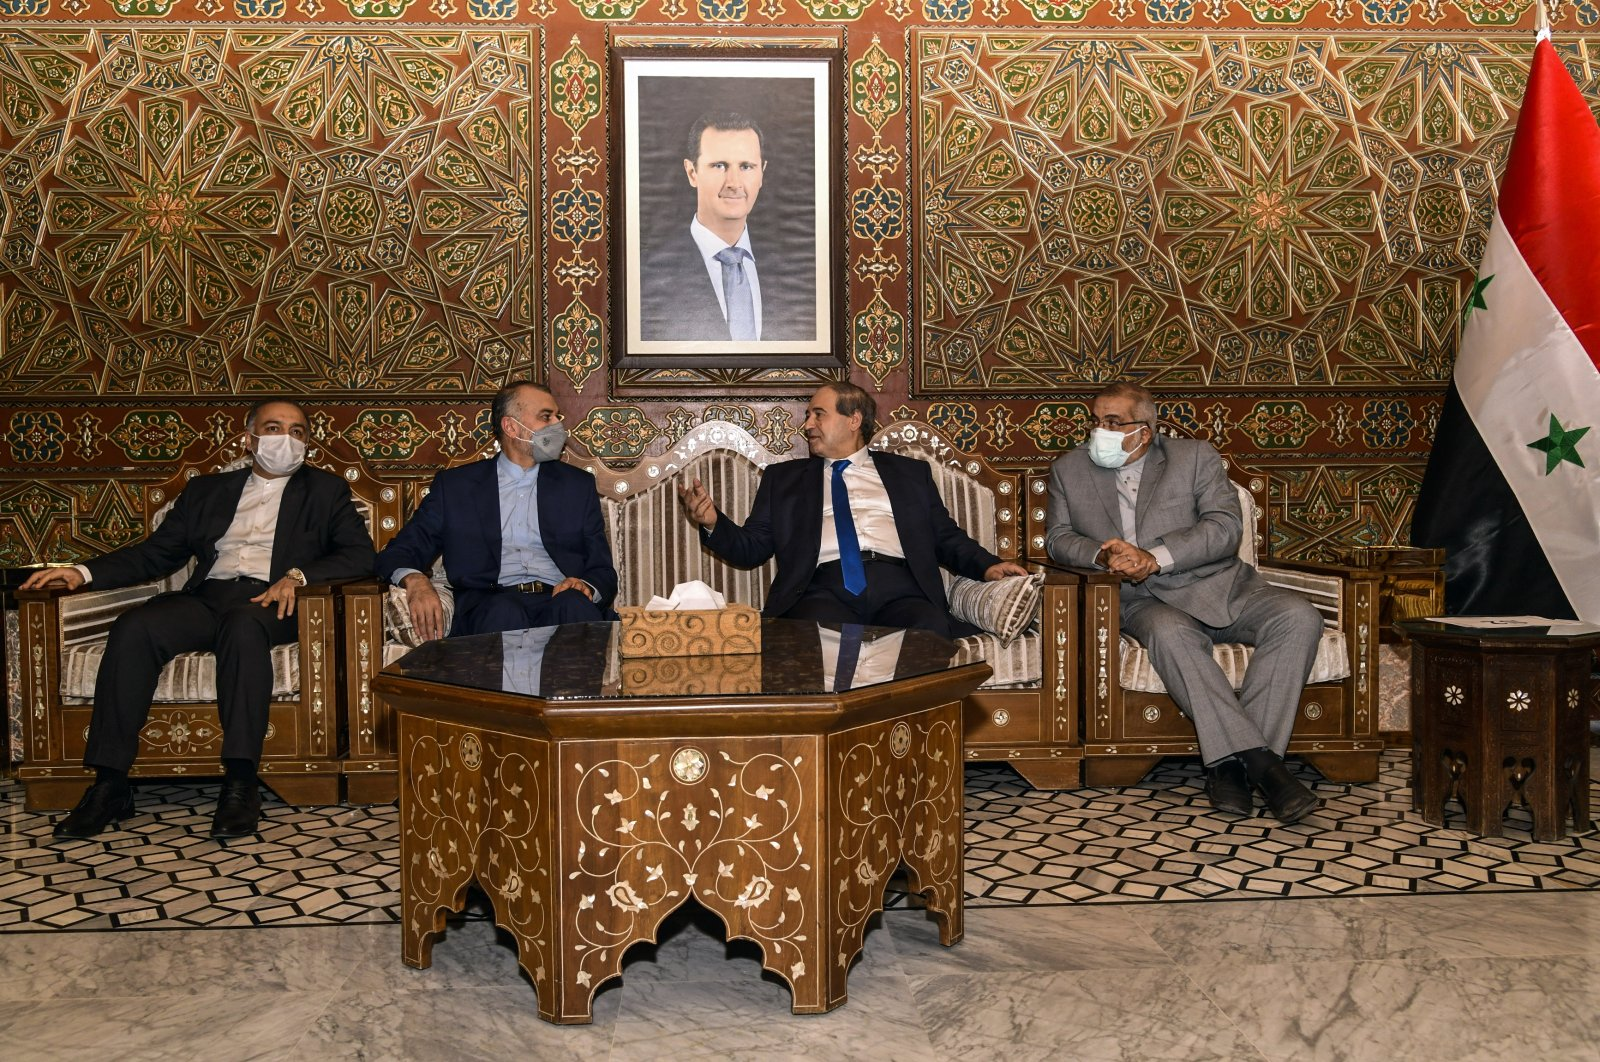 Syria's Foreign Minister Faisal Mekdad, (2-R), receives Iran's new Foreign Minister Hossein Amir-Abdollahian, (2-L), in Damascus, Syria, Sunday, Aug. 29, 2021. (SANA via AP)